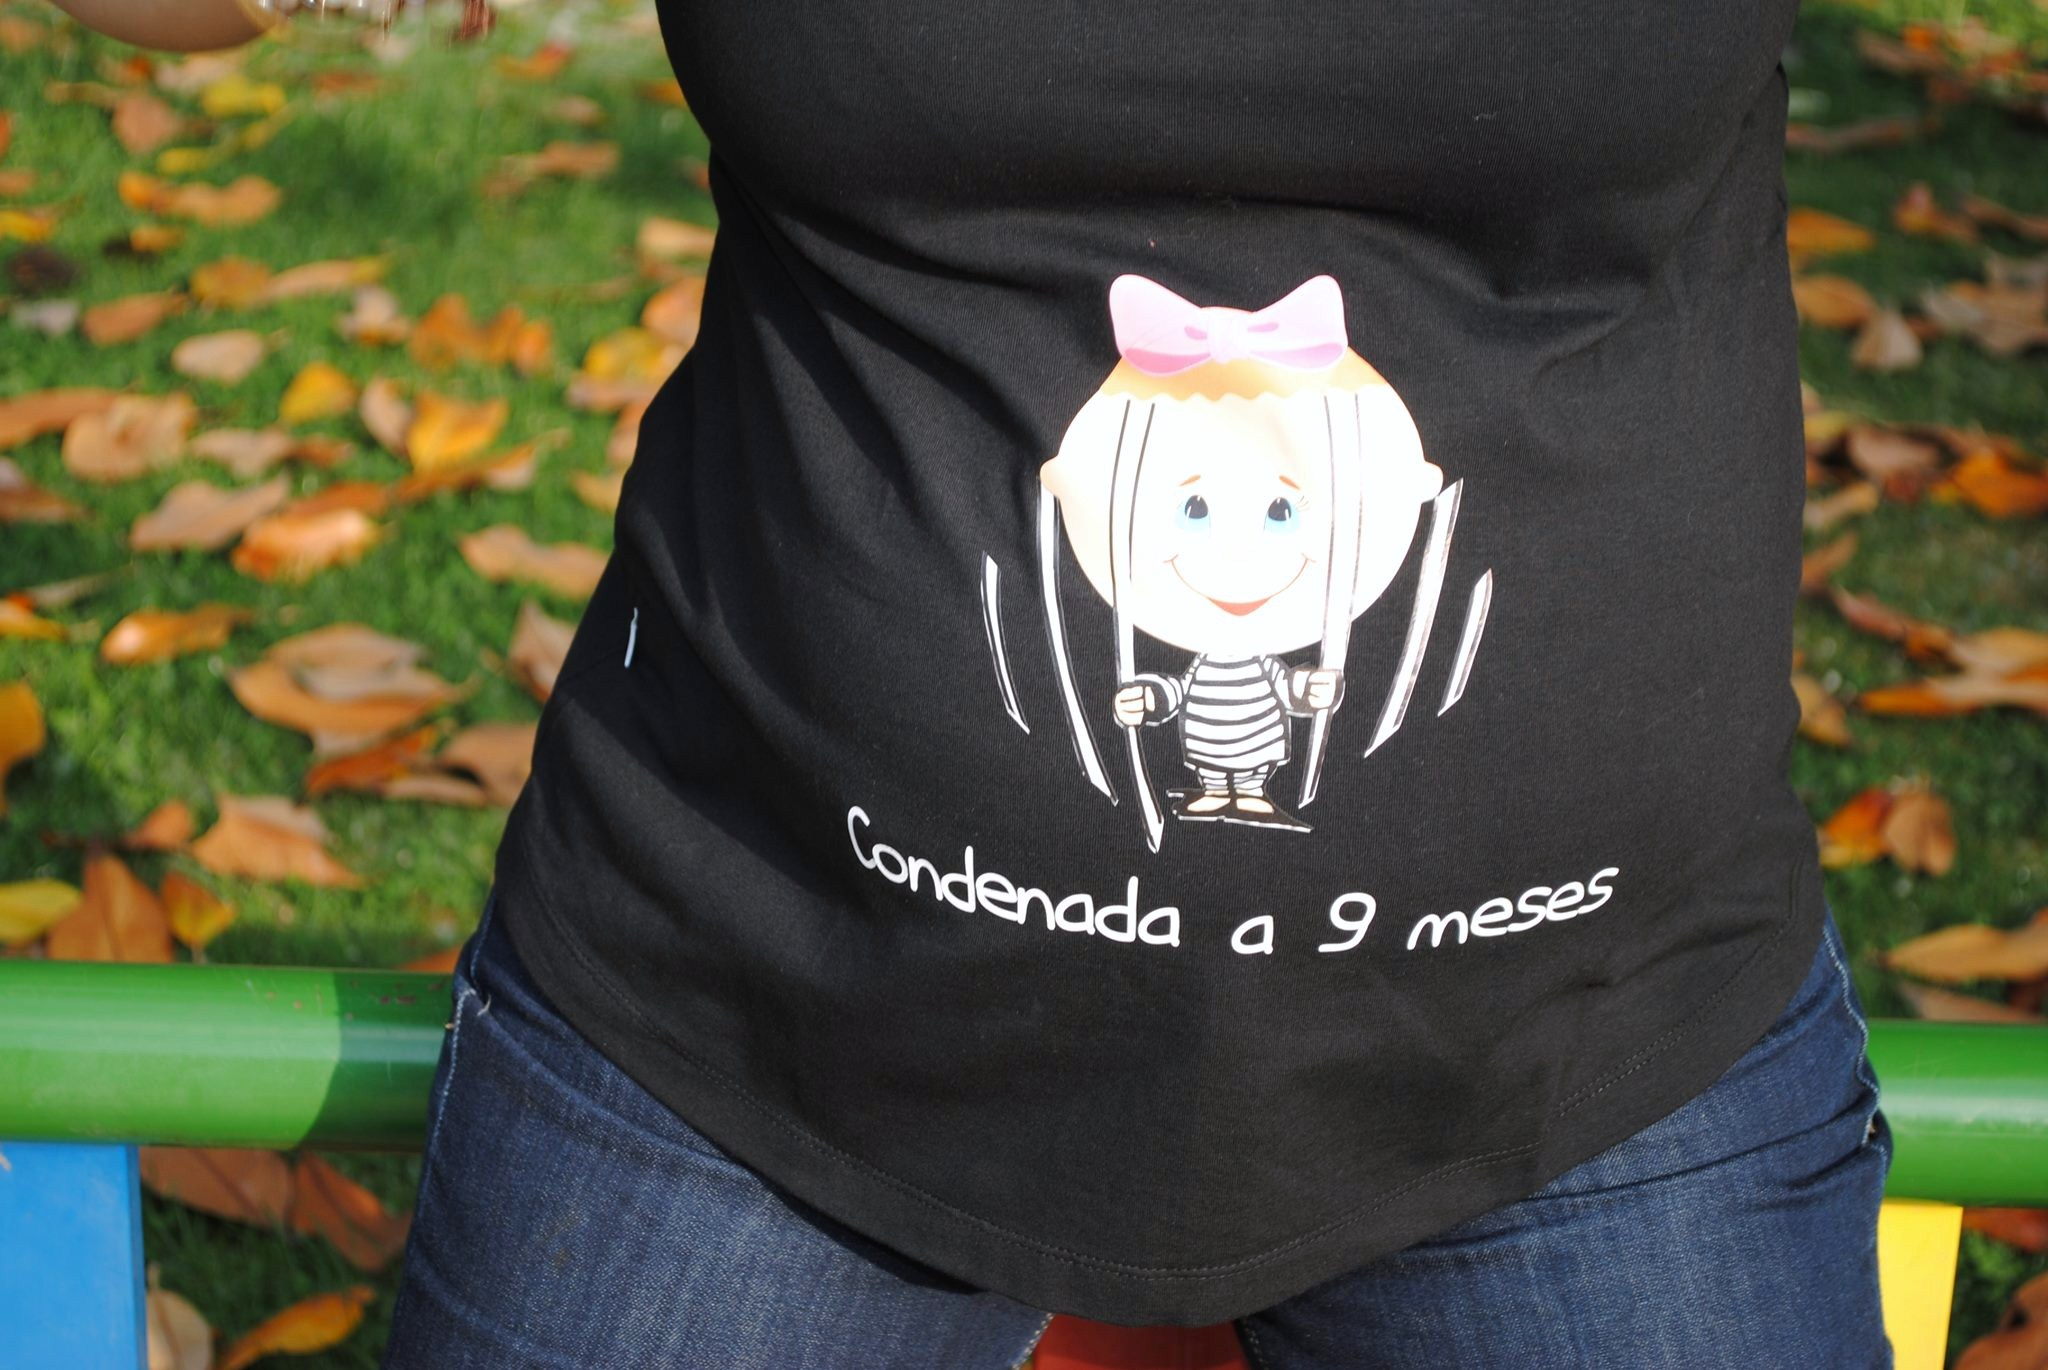 camisetas-embarazadas-divertidas (1)